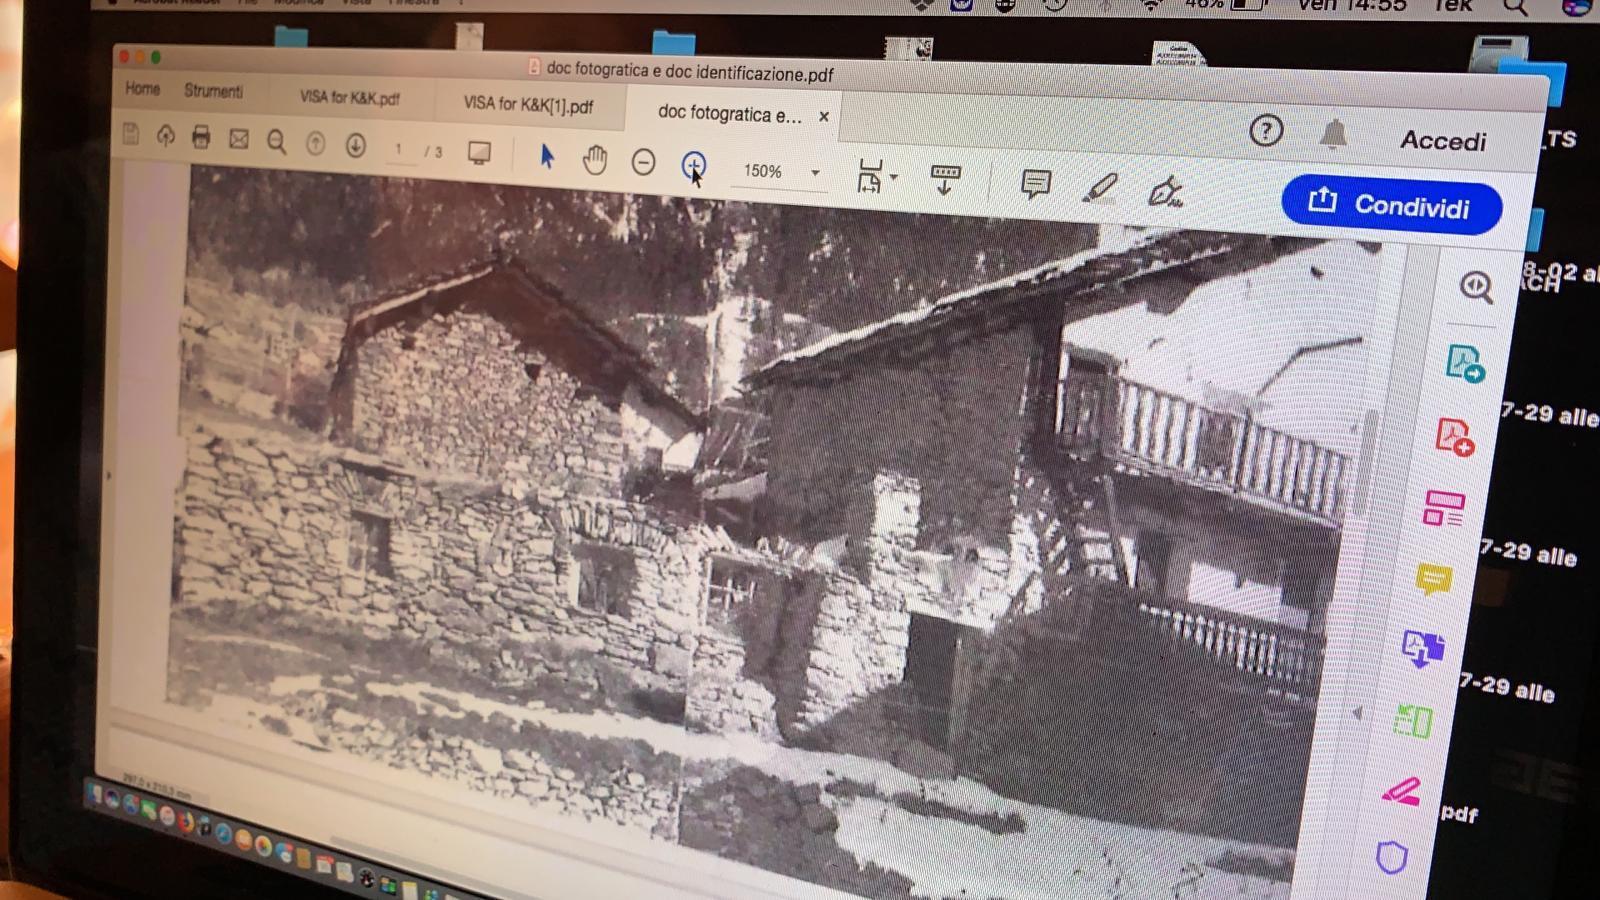 Horsky domcurik - Archivne snimky ako dokaz,ze aj na lavo bola budova..snad raz aj my